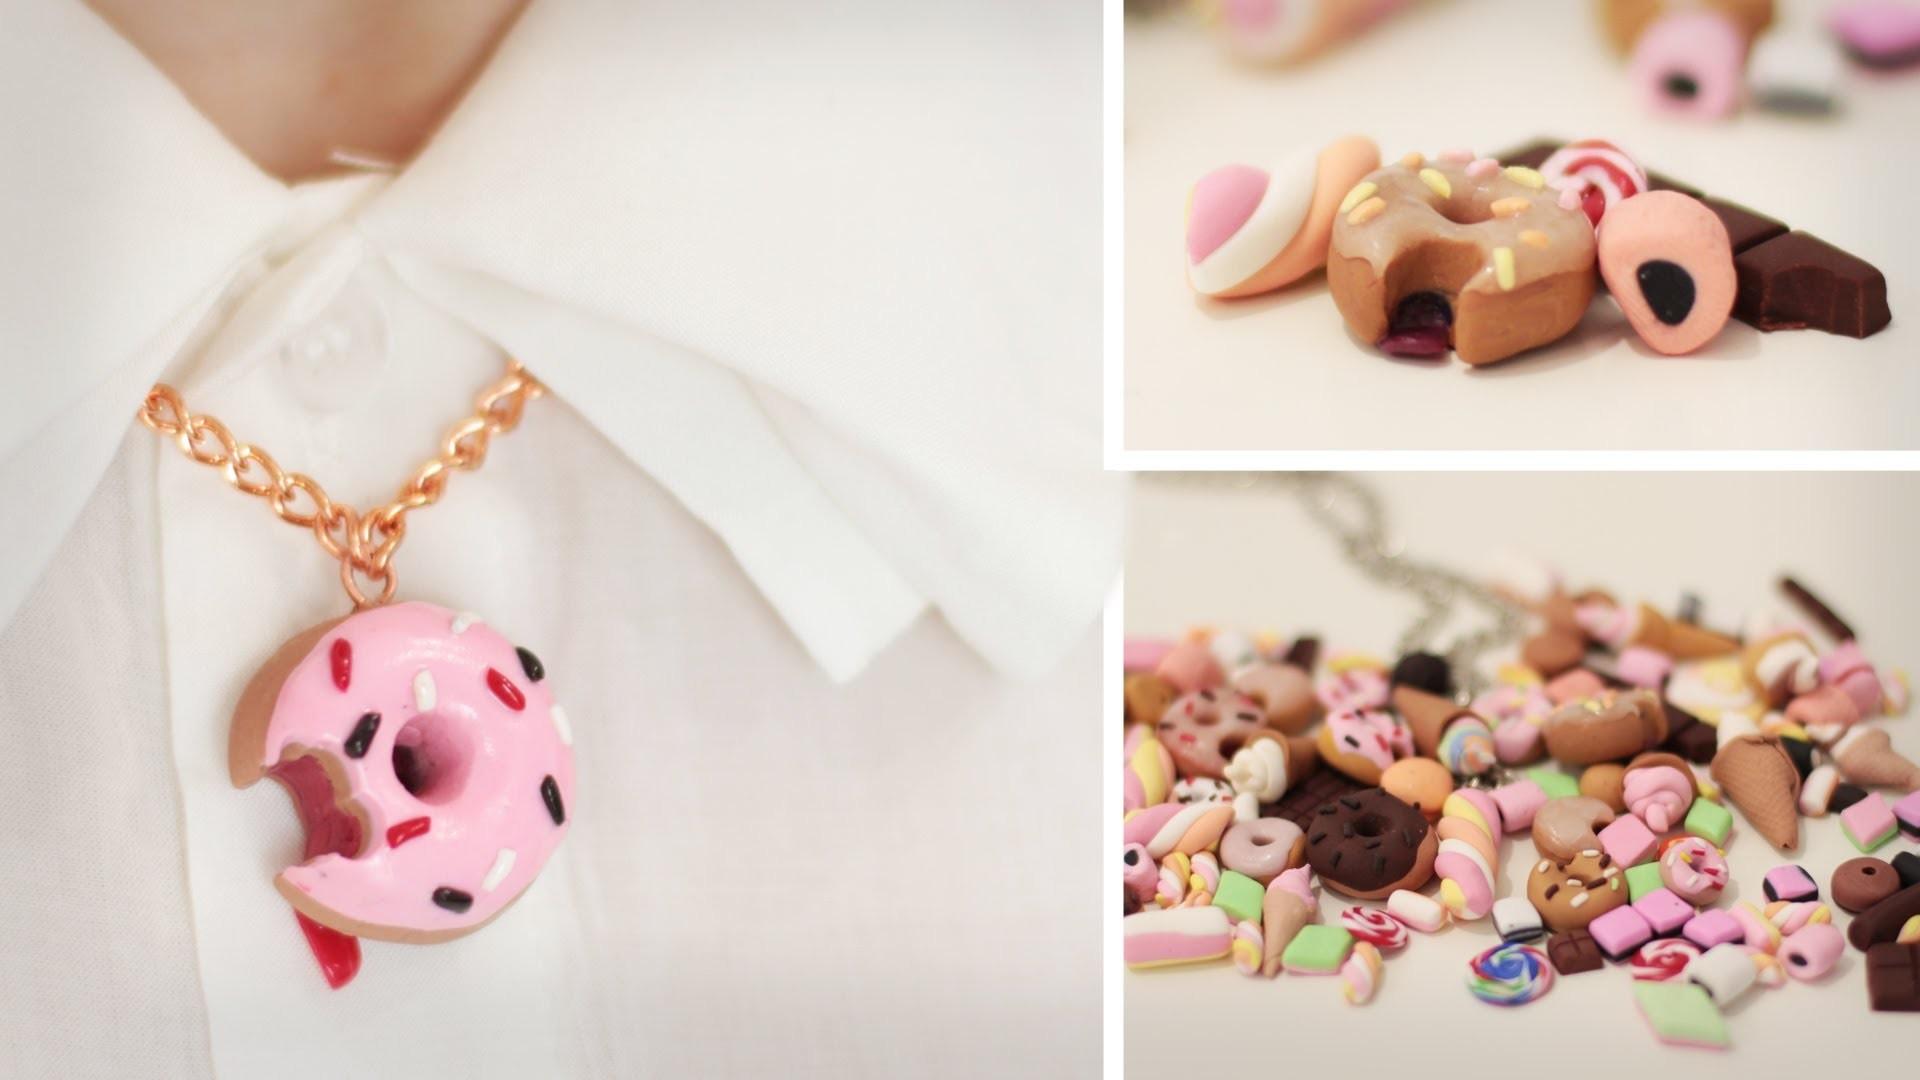 DIY Süßes aus Fimo - Donut, Eis, Schoki, Marshmallows, Haribo - für Ketten, Handys - Cabochons